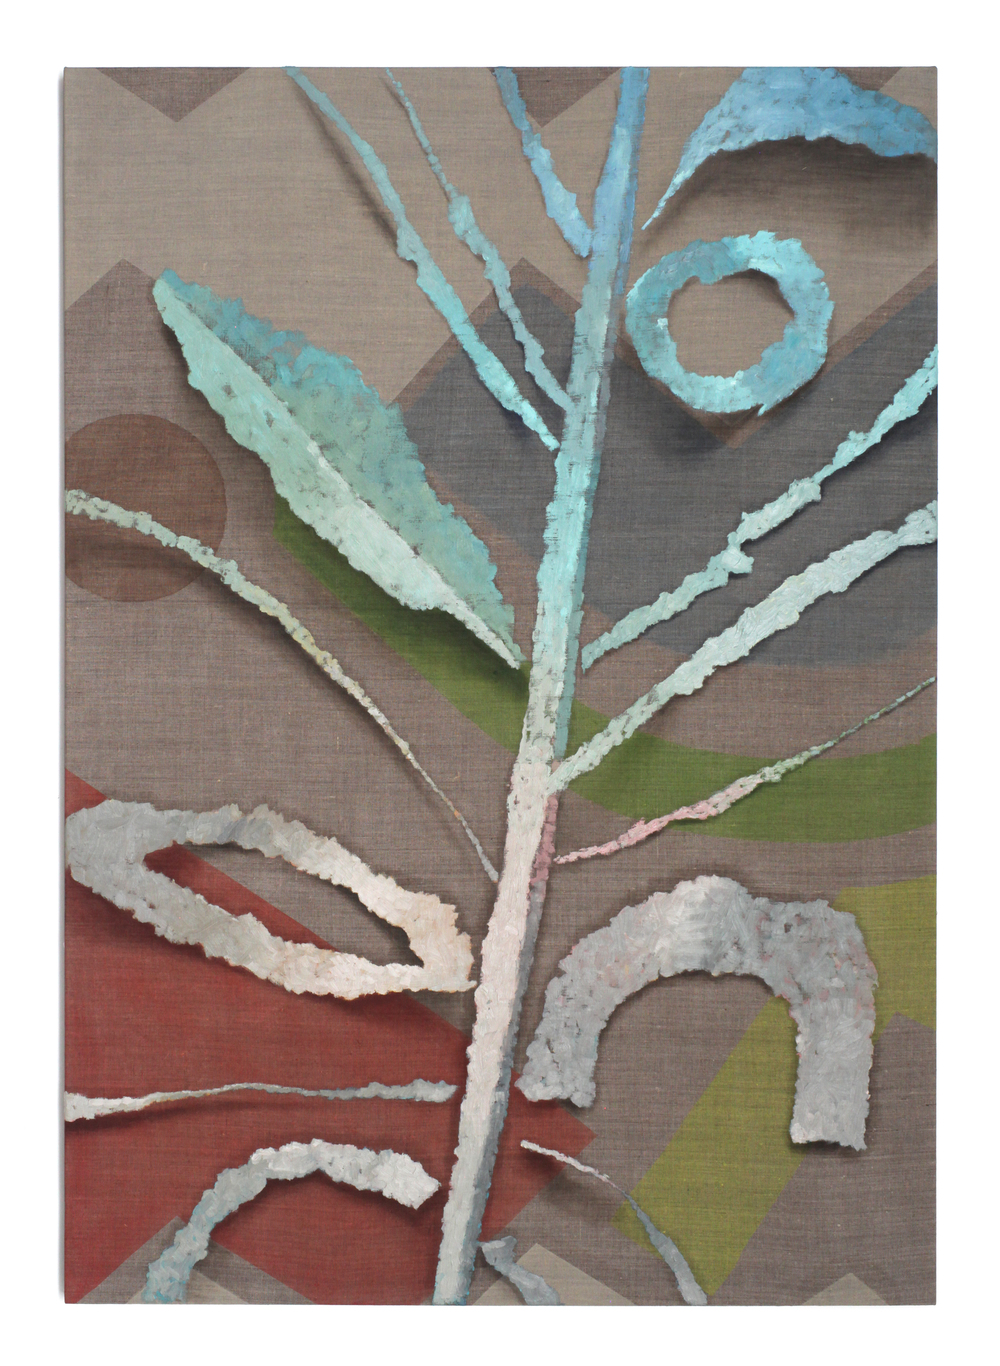 Twig #3